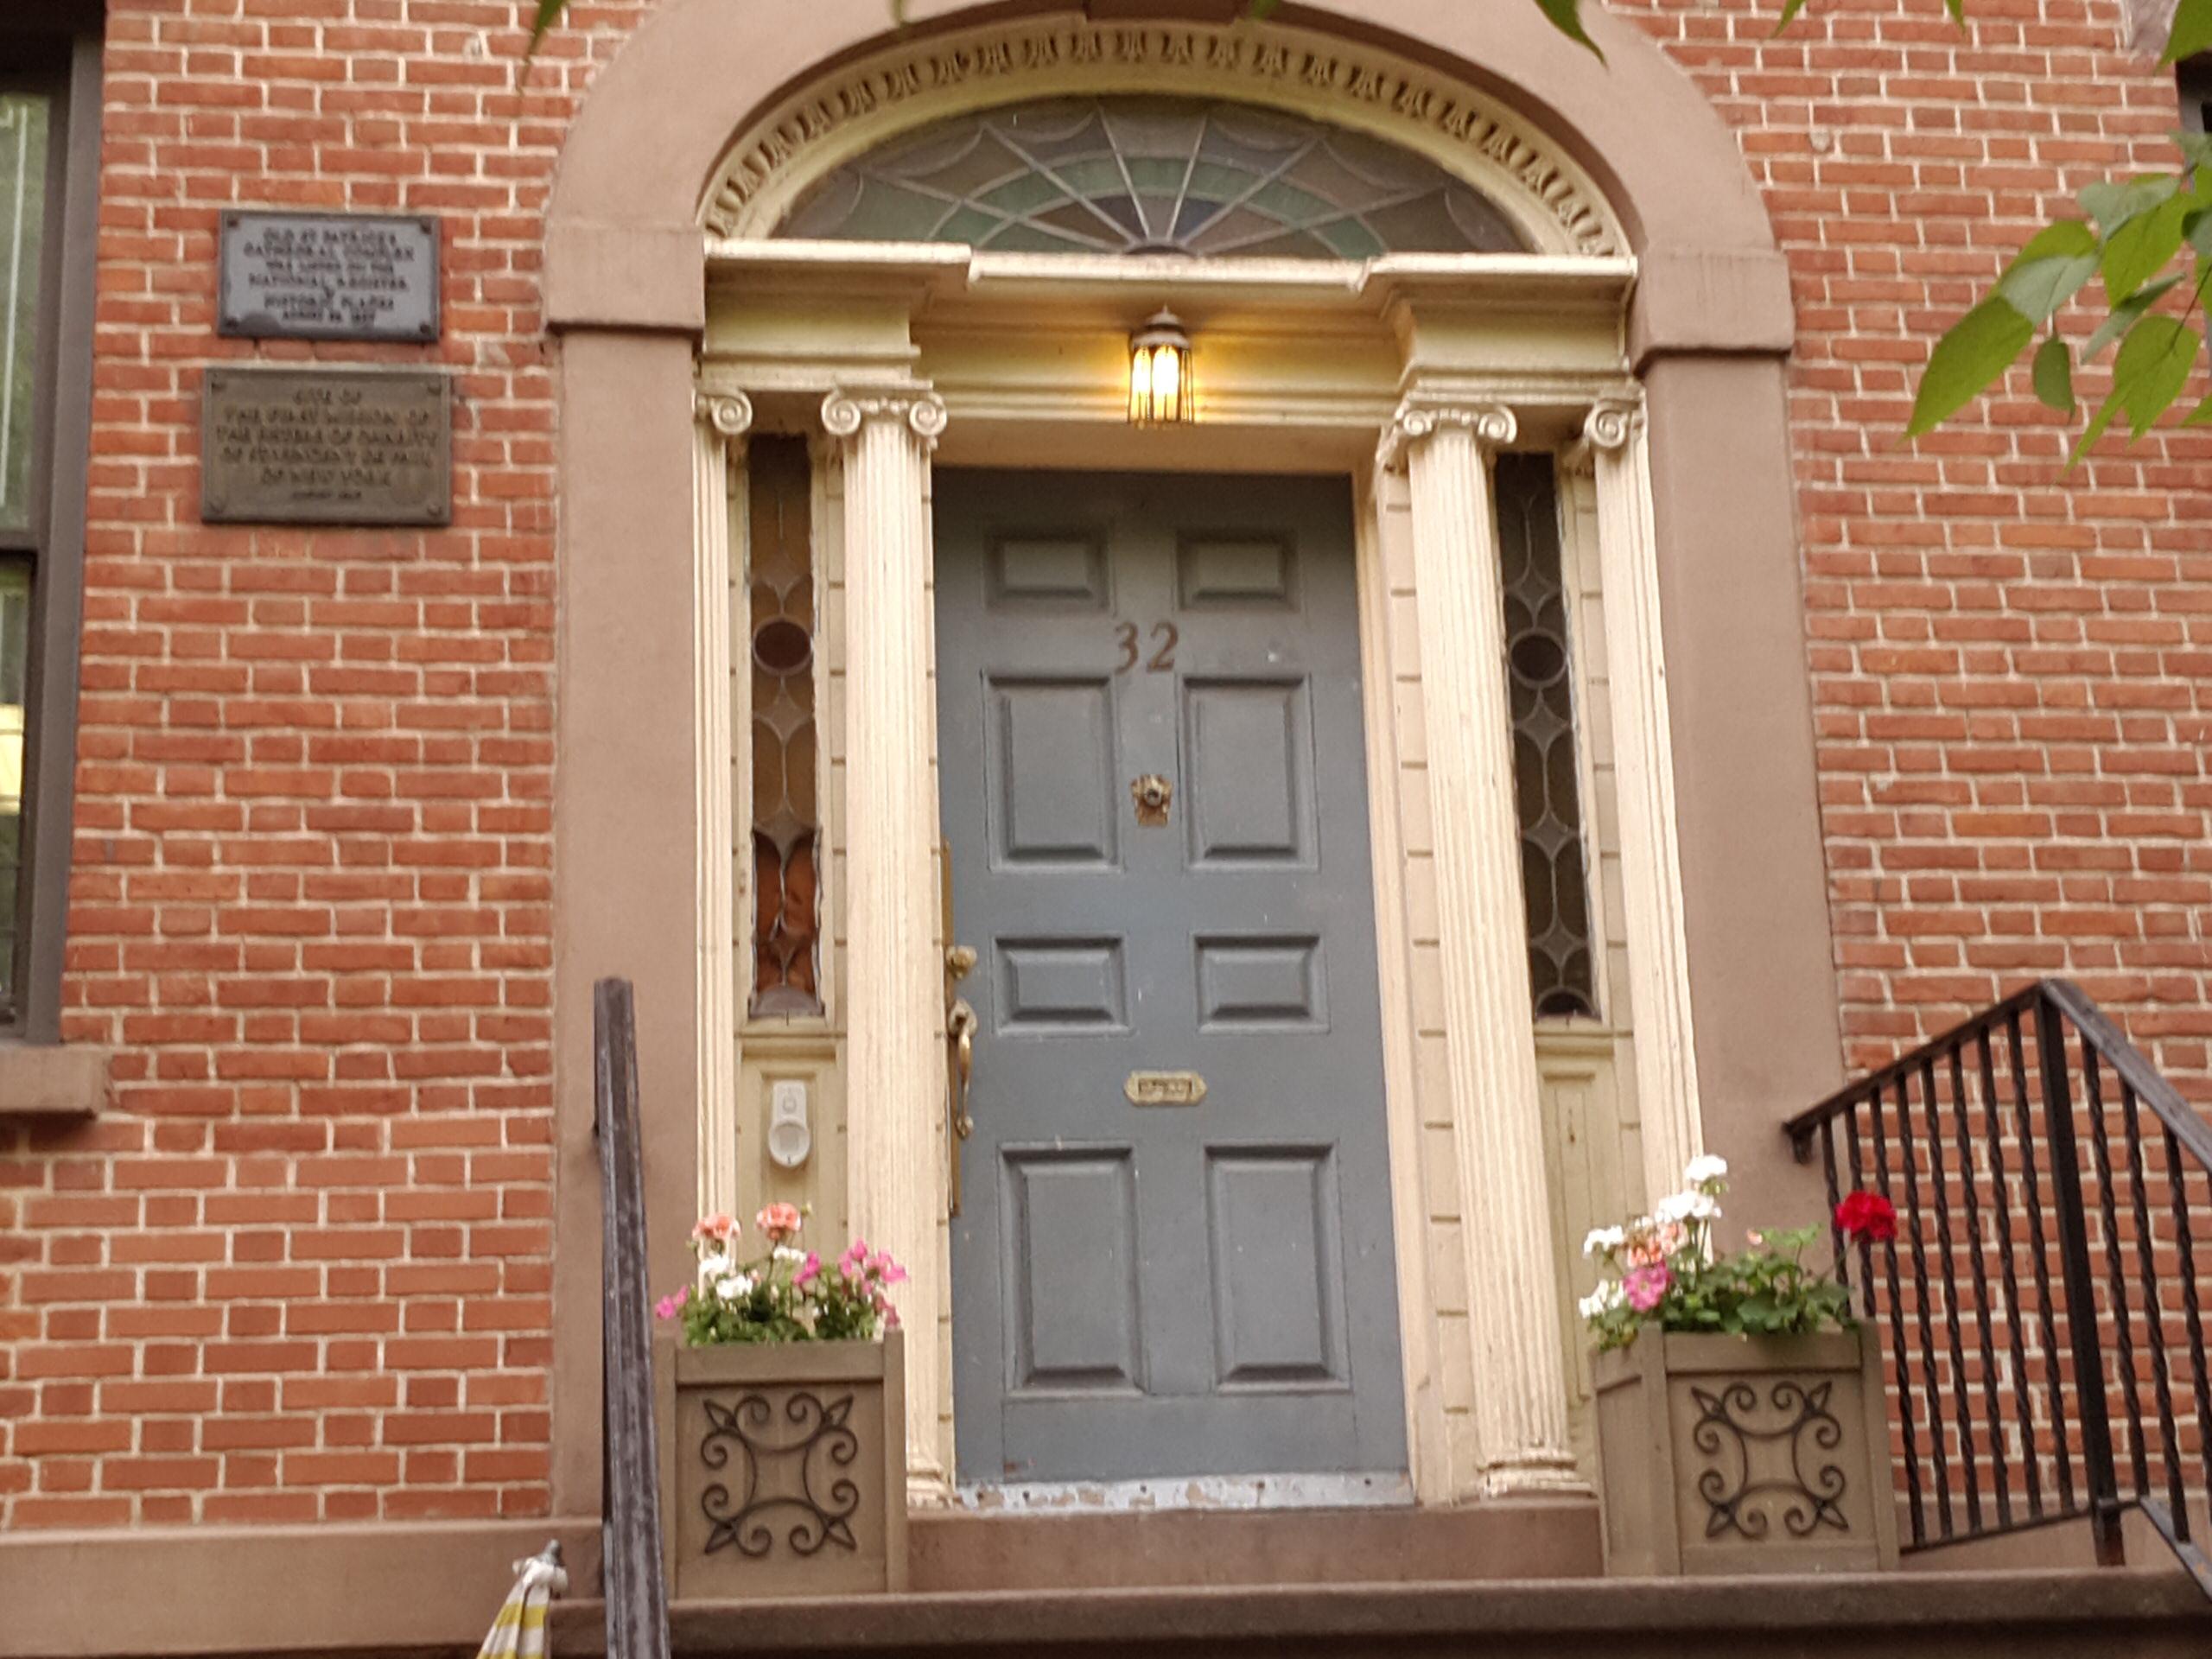 St. Patrick's School 32 Prince 3